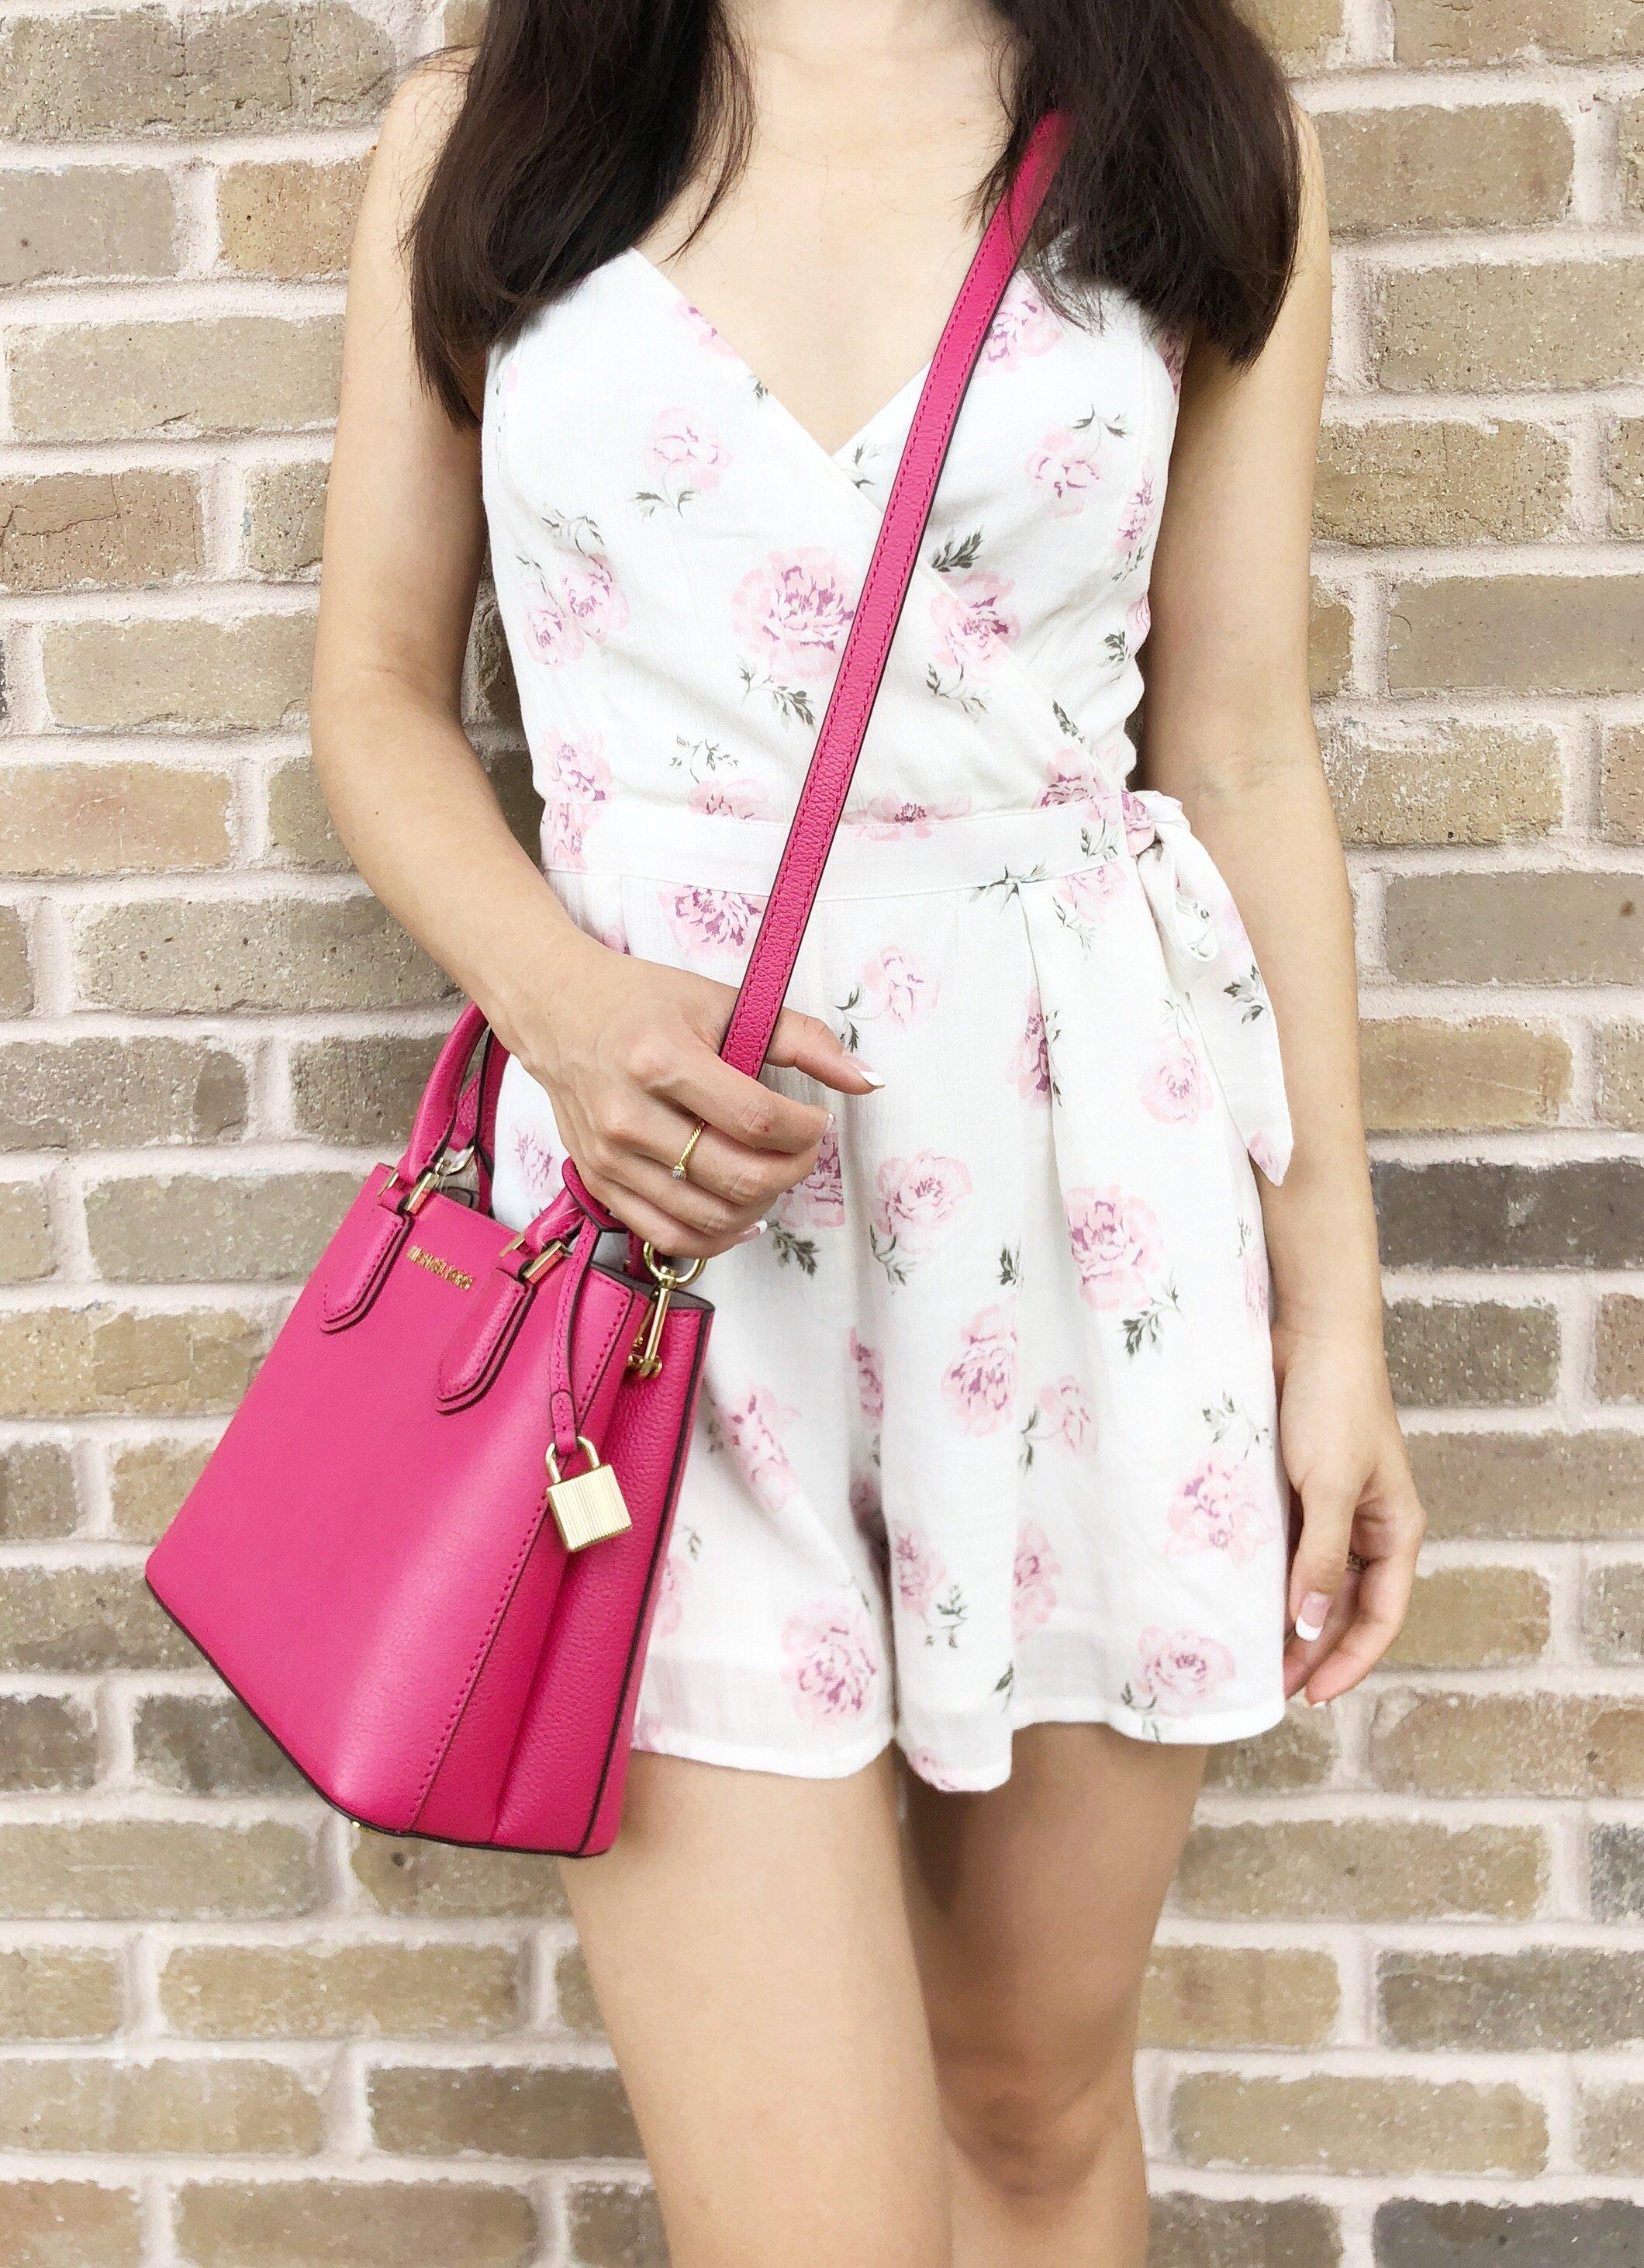 a9e465bbd772 Michael Kors Adele Mercer Medium Messenger Bag Ruben Red Hot Pink ...